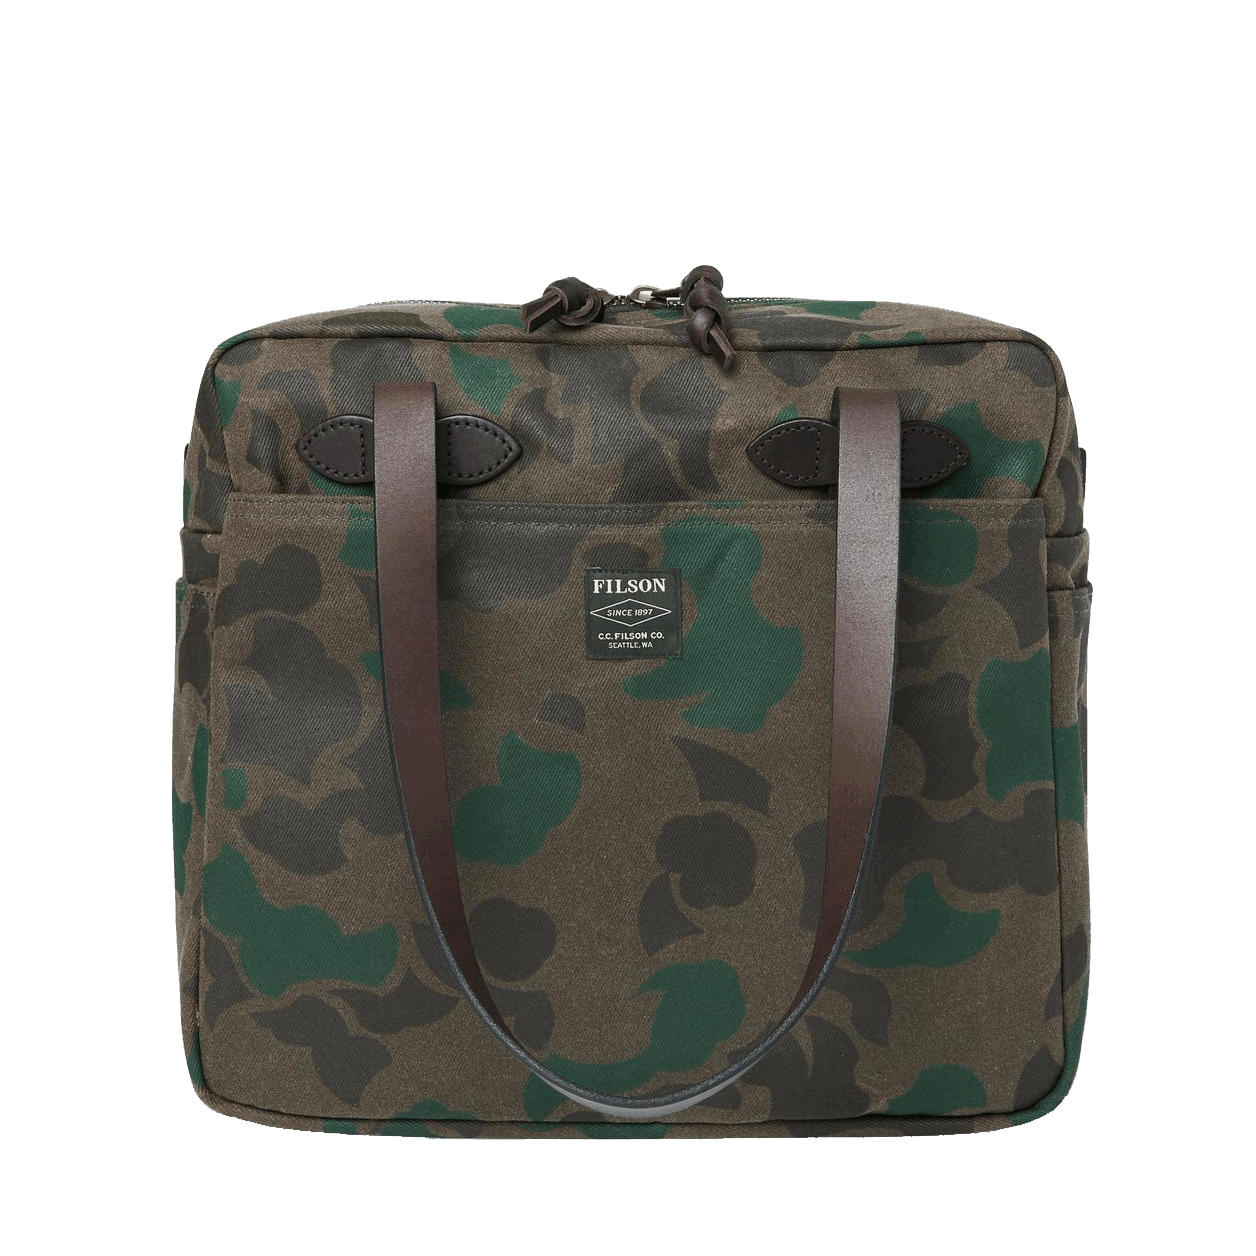 Filson Zip Tote Bag - Camo